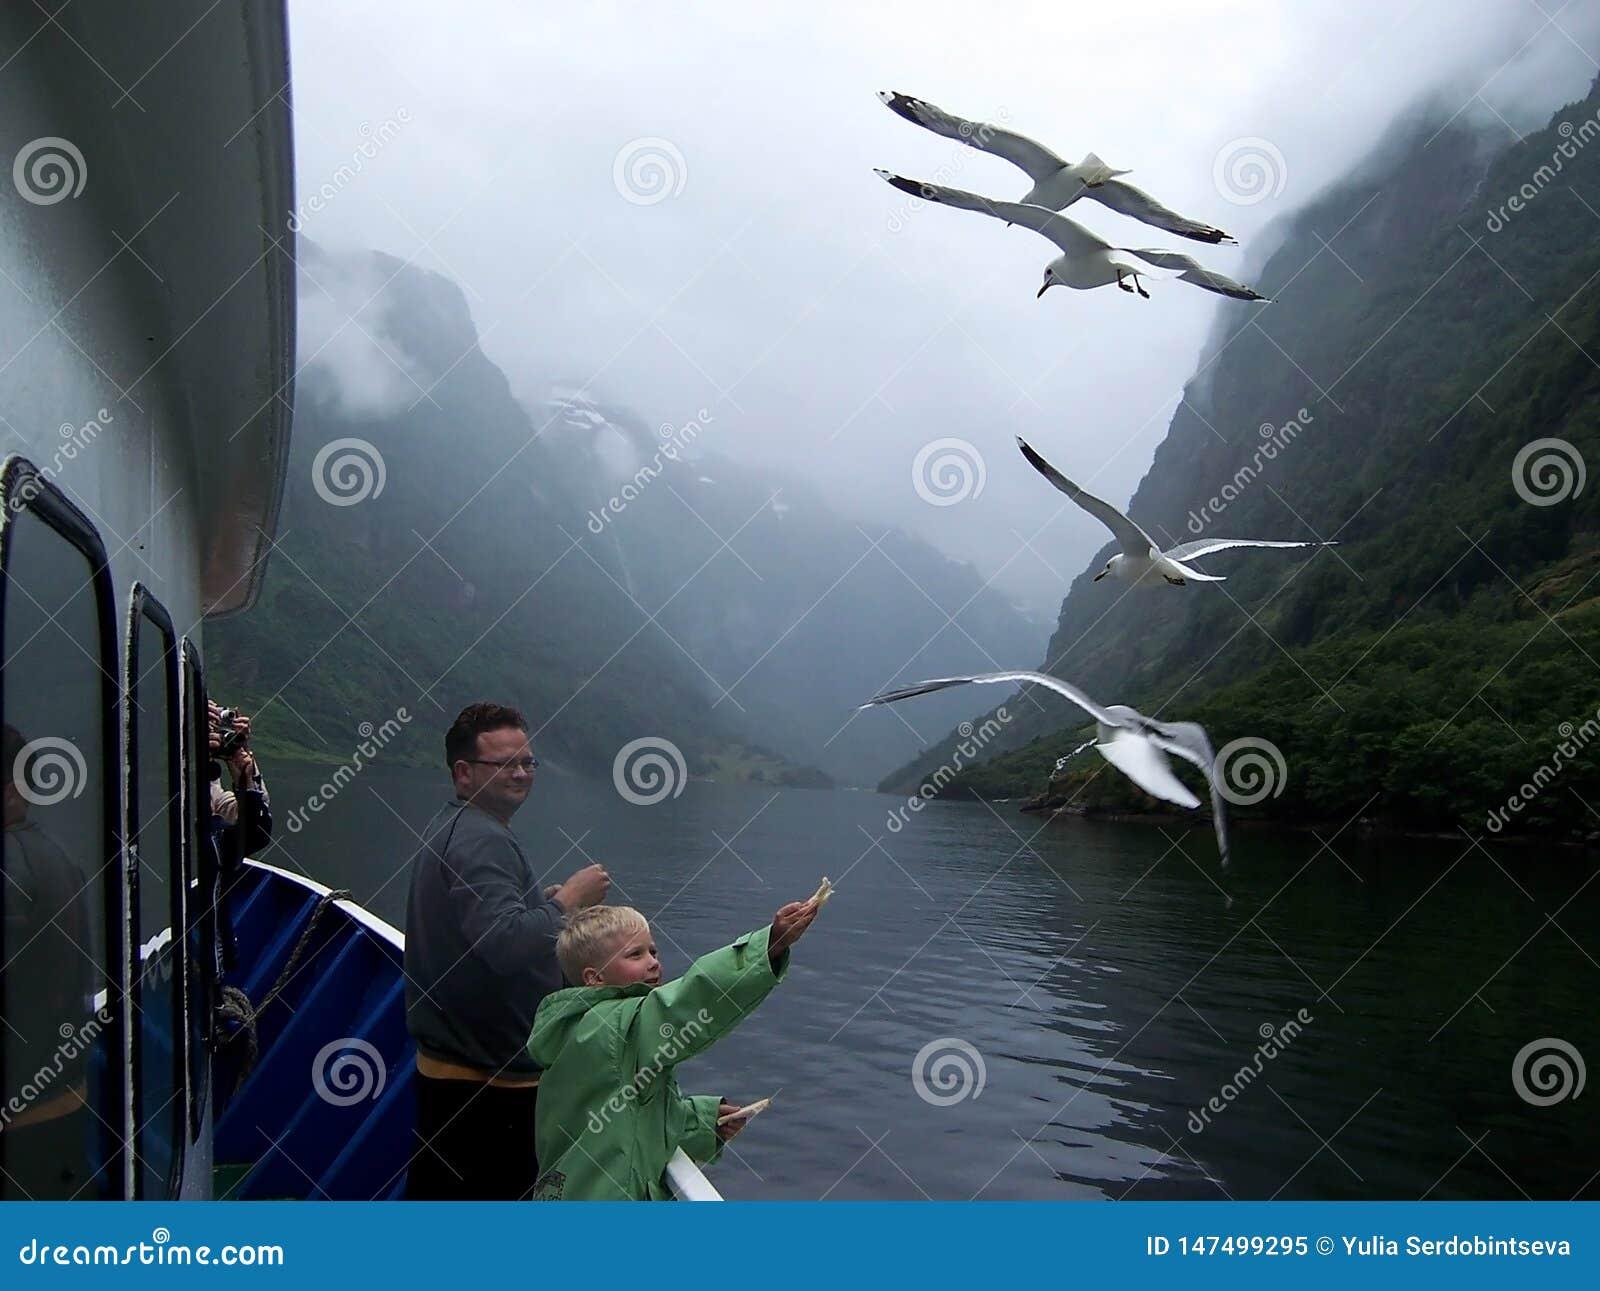 Scandinavian boy feeding seagulls from a cruise ship